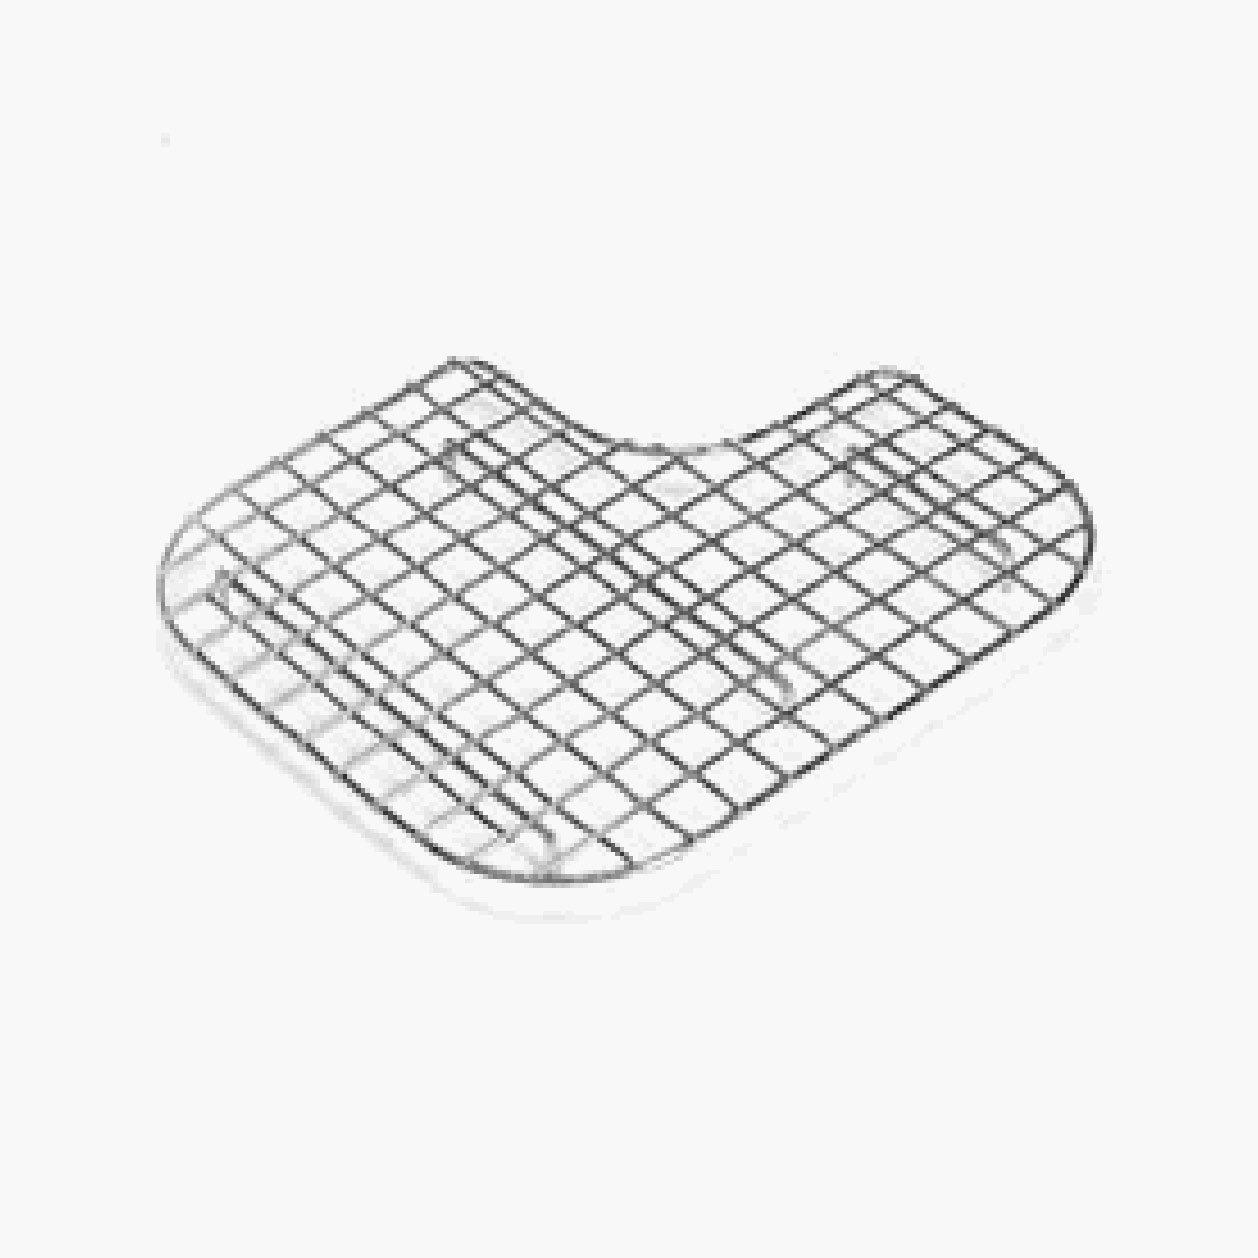 Franke EuroPro Stainless Steel Bottom Grid for GNX11016 / GNX120 Sinks